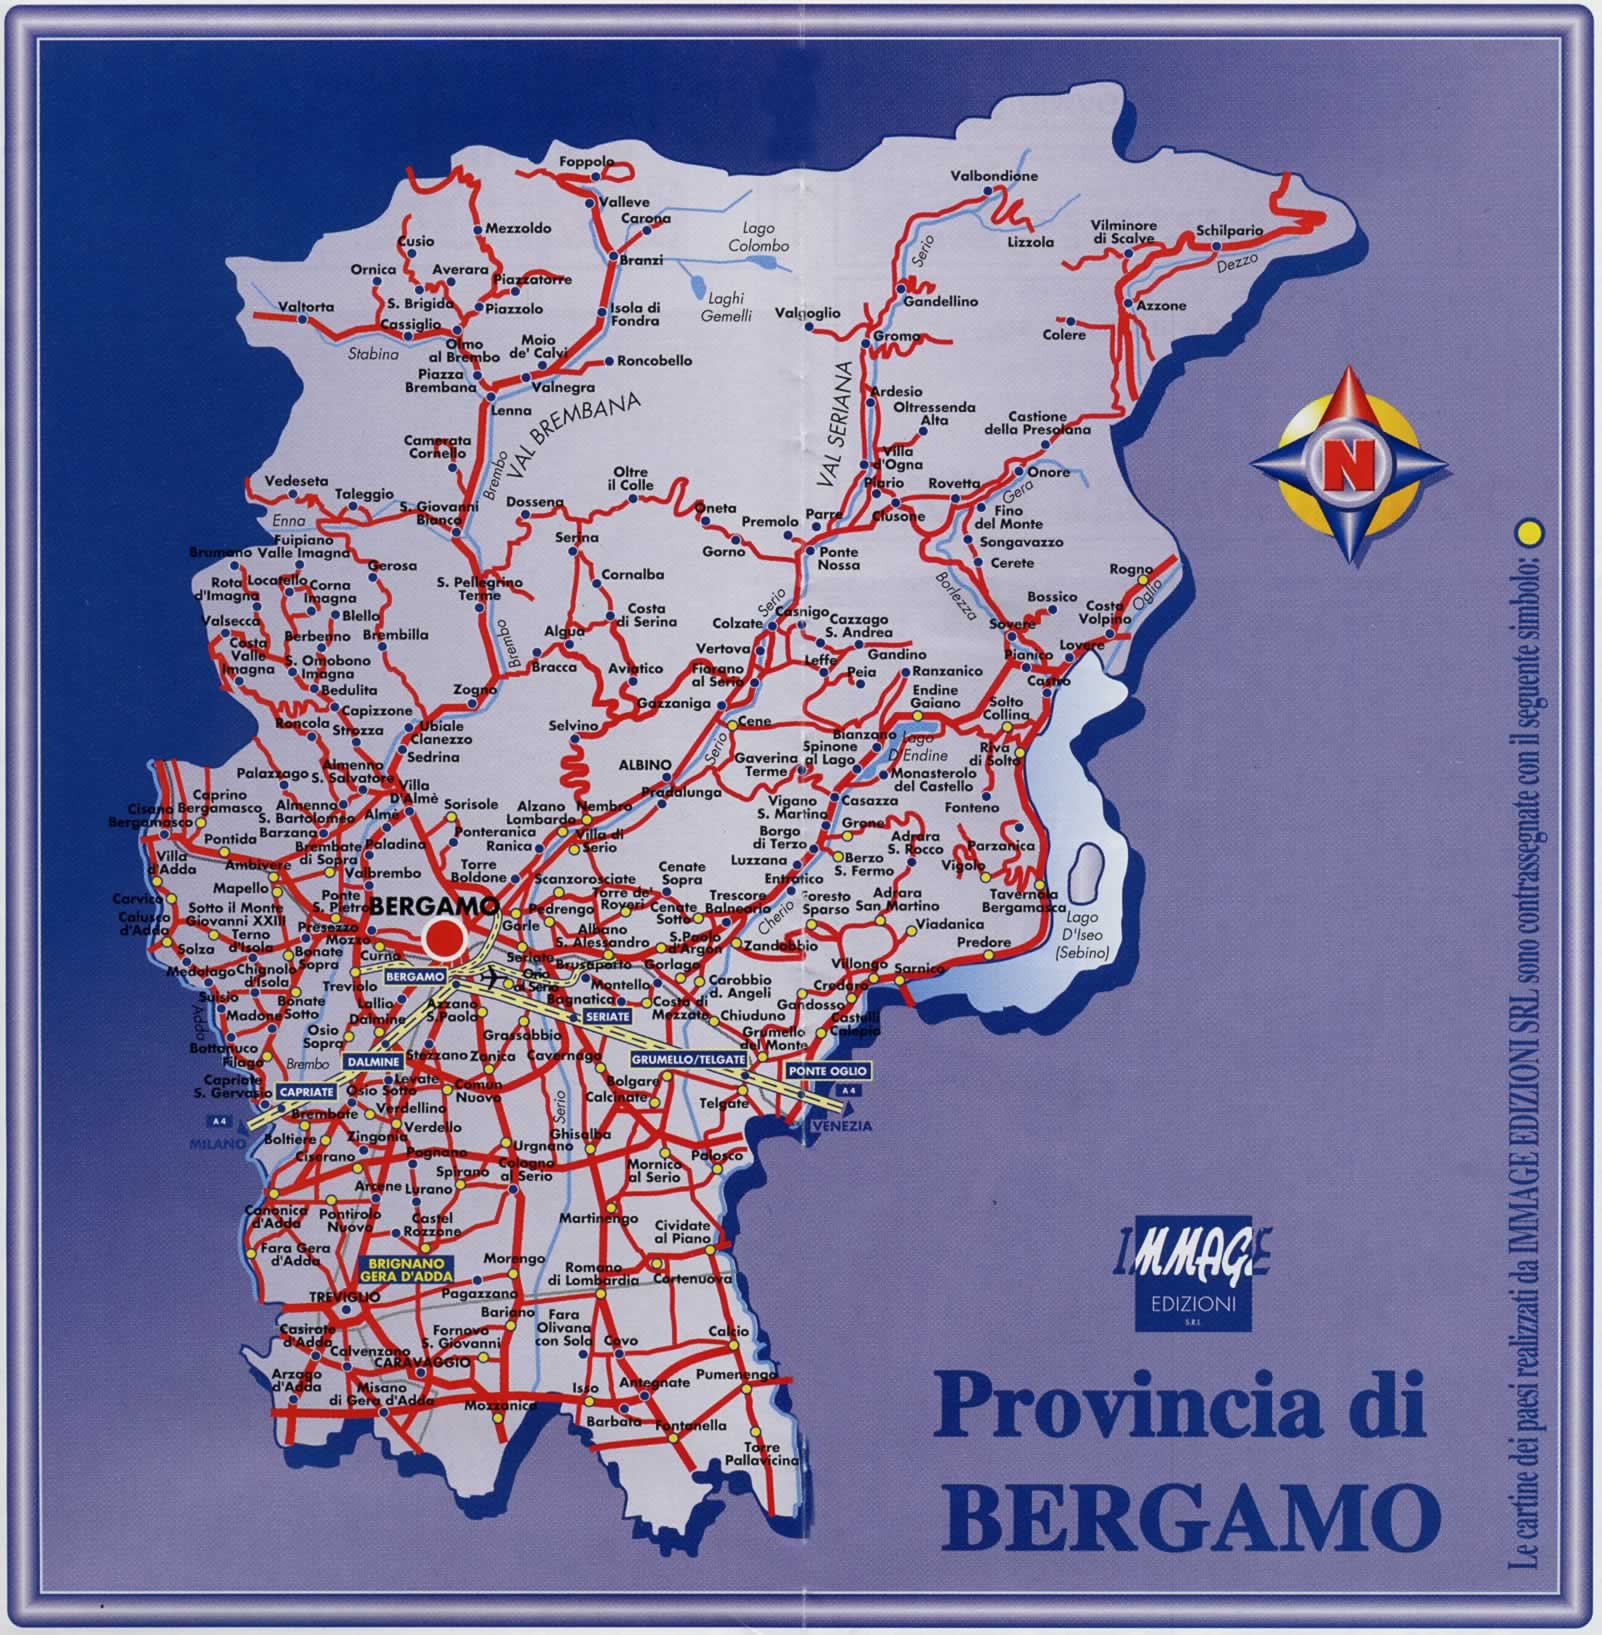 Top cucina ceramica mobilifici bergamo e provincia for Mobilifici caserta e provincia